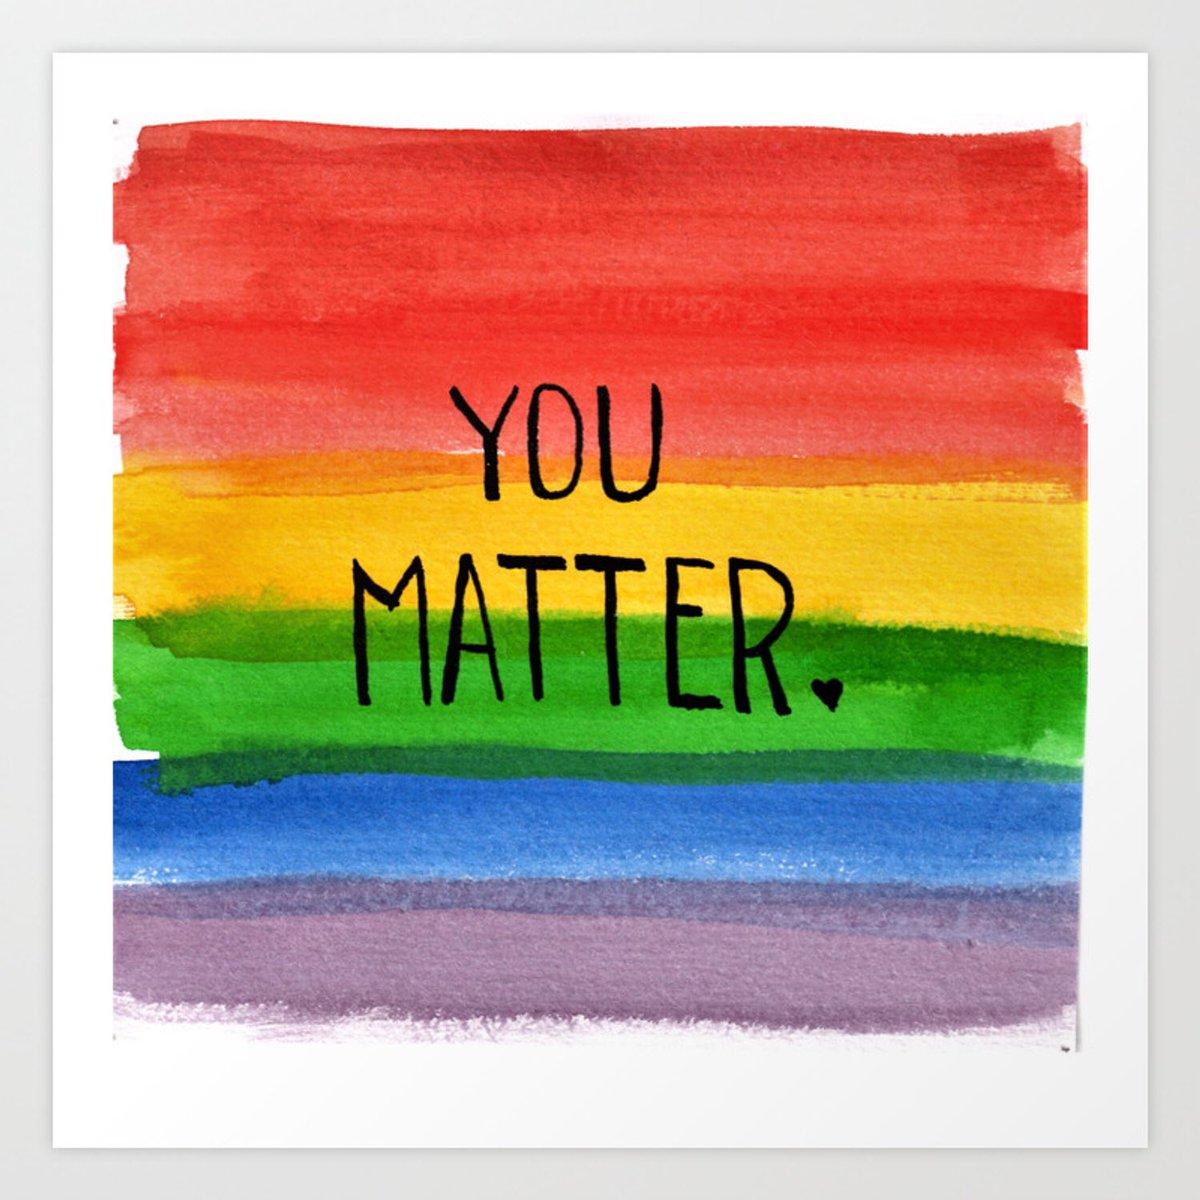 You matter. 🏳️🌈